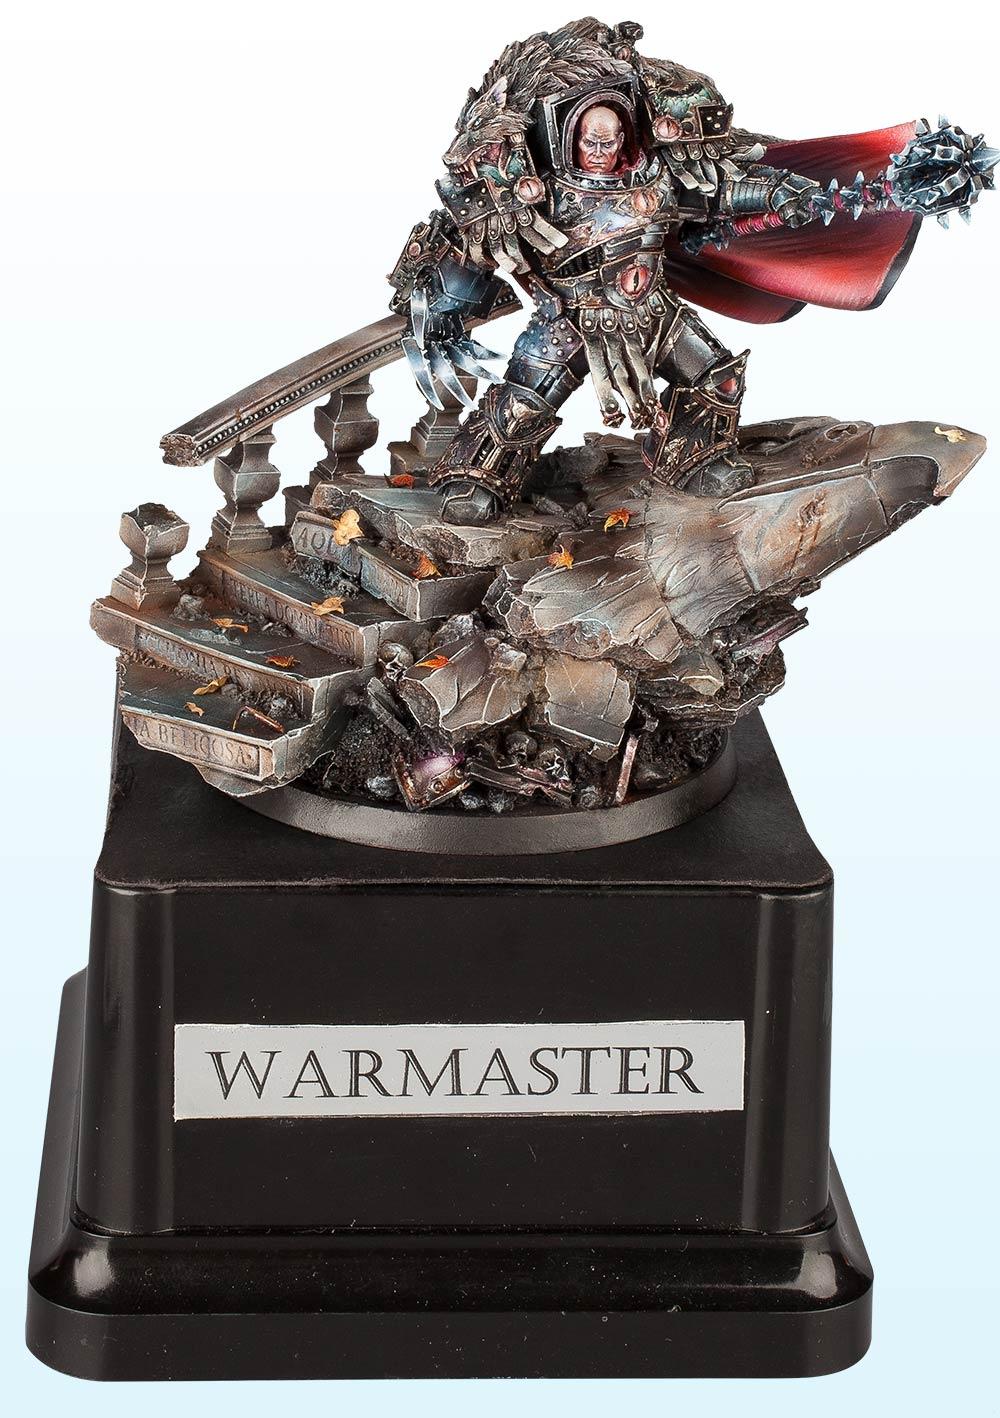 Warhammer 40,000 Large Model: Silver – 2014